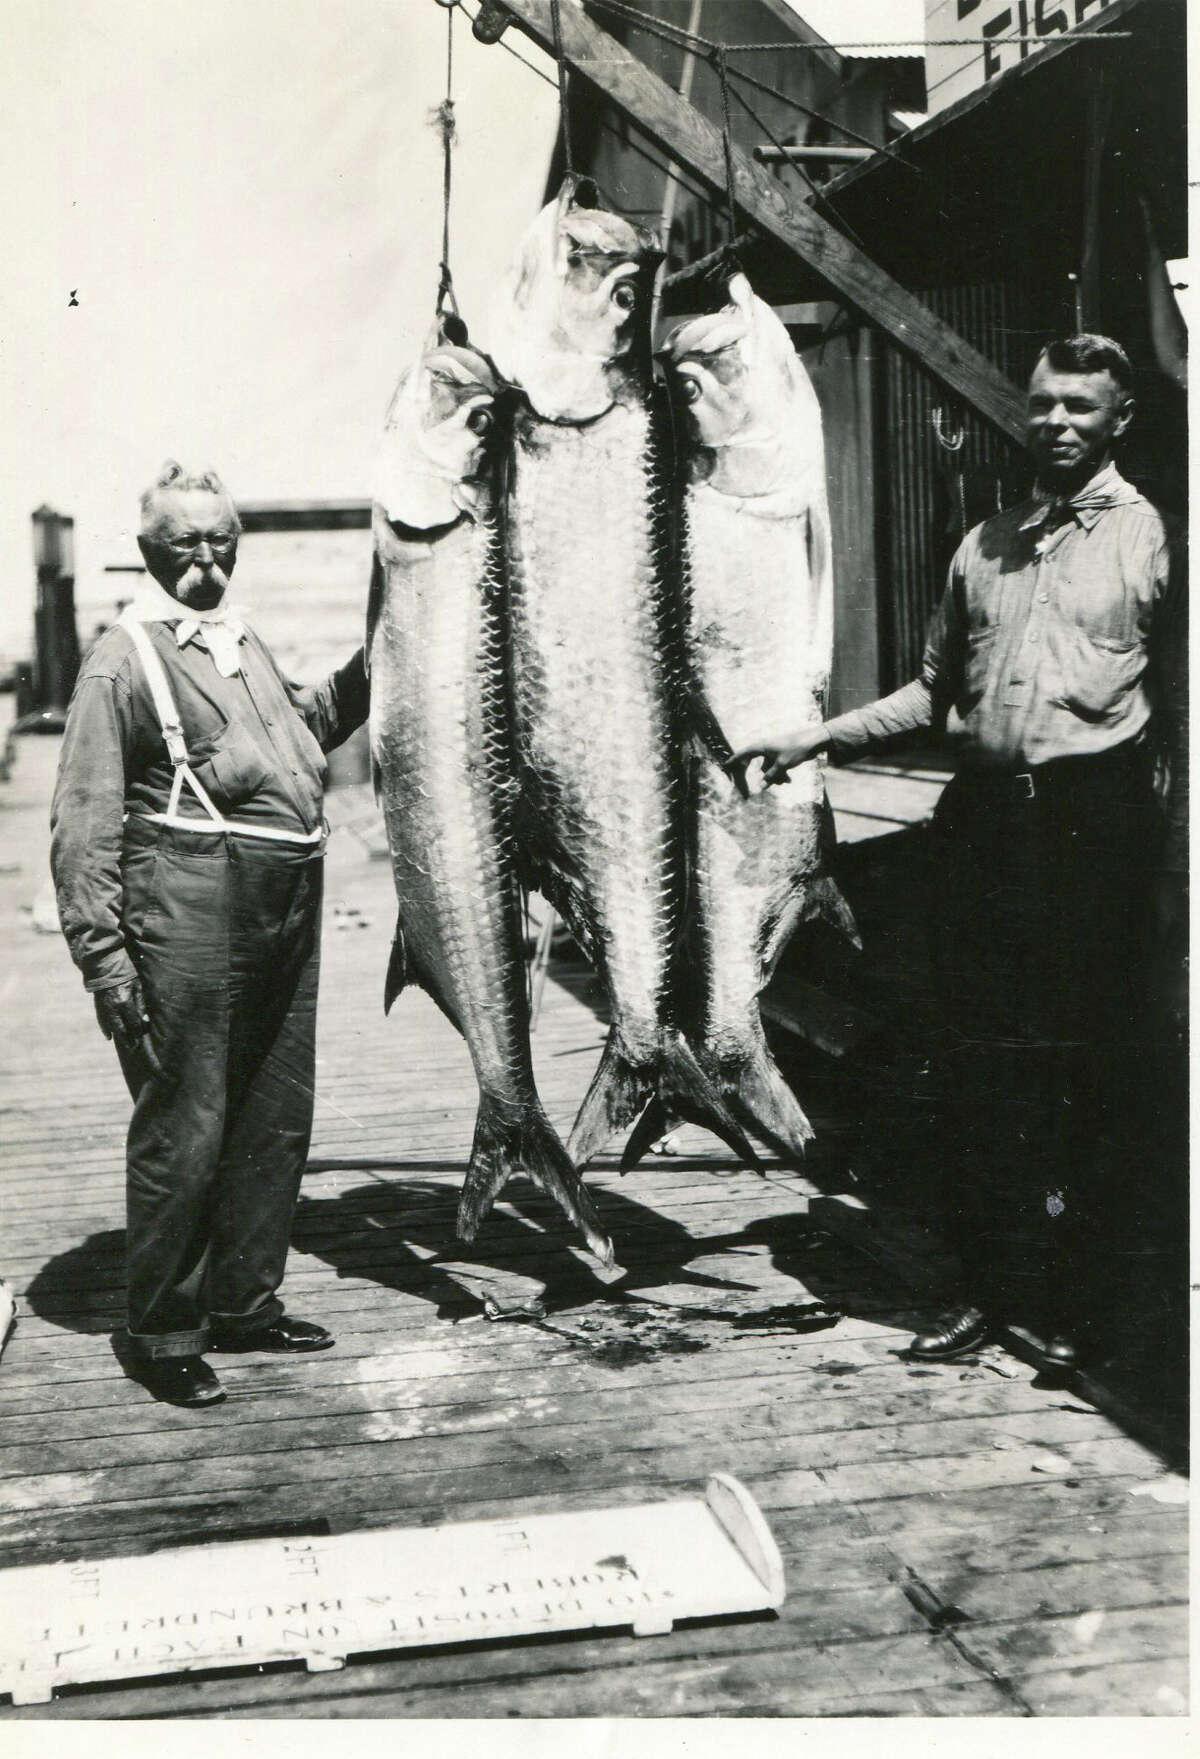 Tarpon, sailfish, mackerel, kingfish and more filled the docks throughout the year.